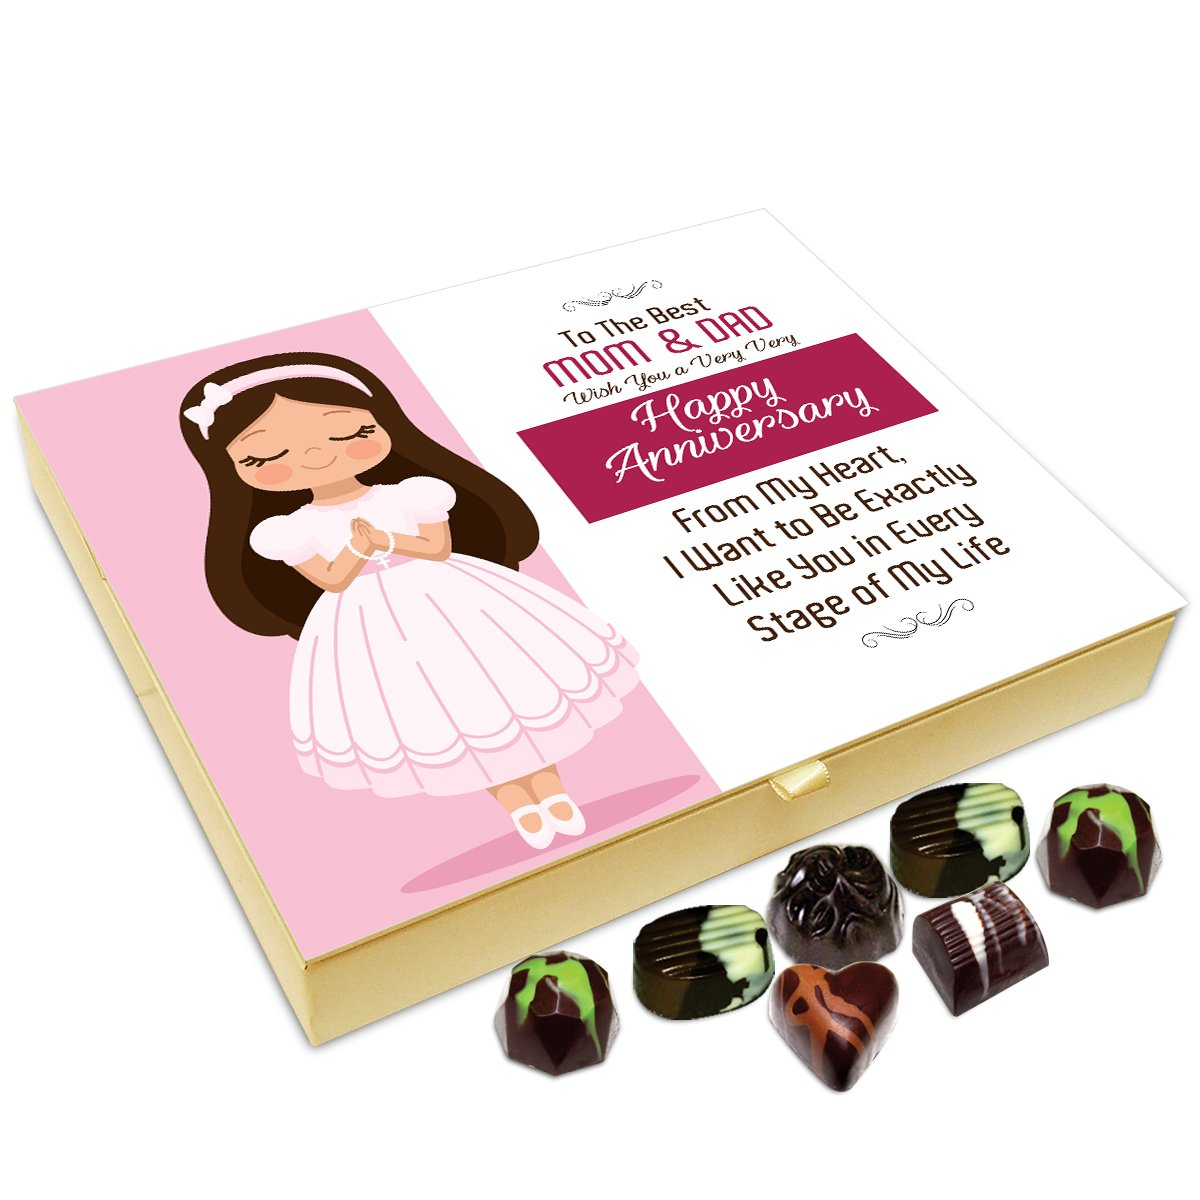 Chocholik Anniversary Gift Box – to The Best Mom and dad, Wish You A Very Happy Anniversary Chocolate Box – 20pc